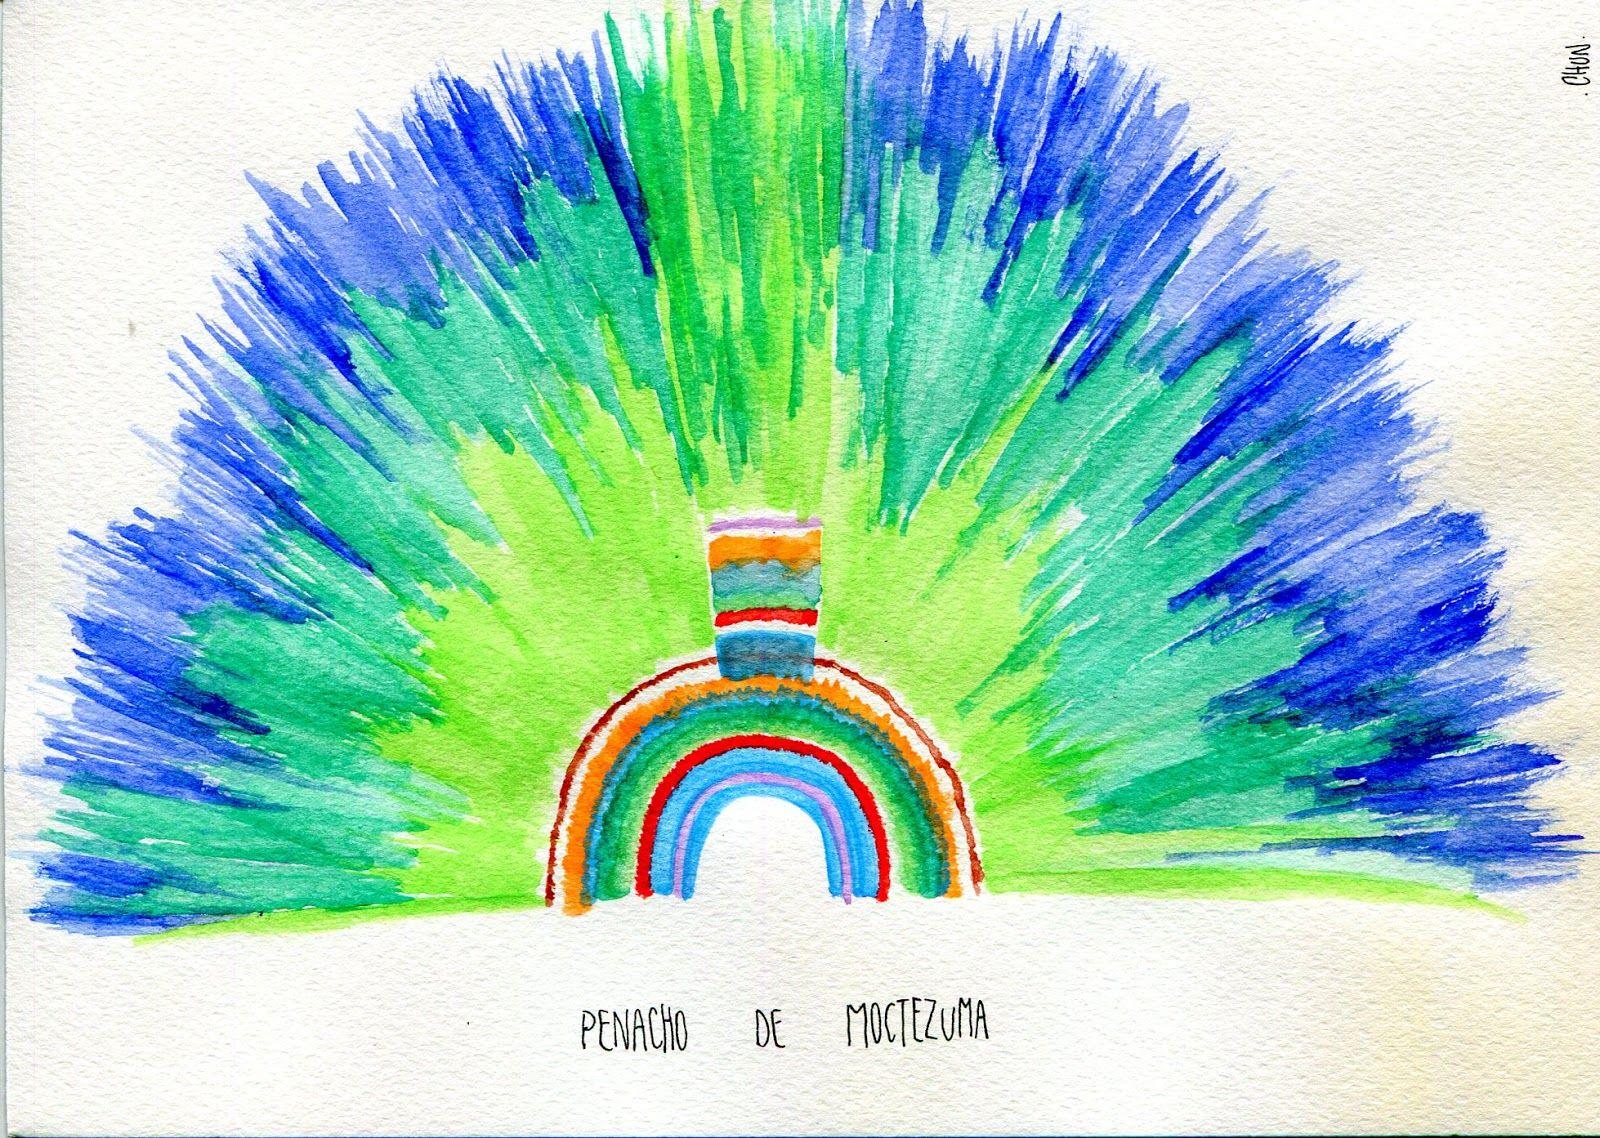 Penacho De Moctezuma 2013 Dibujos Proyectos Negocios